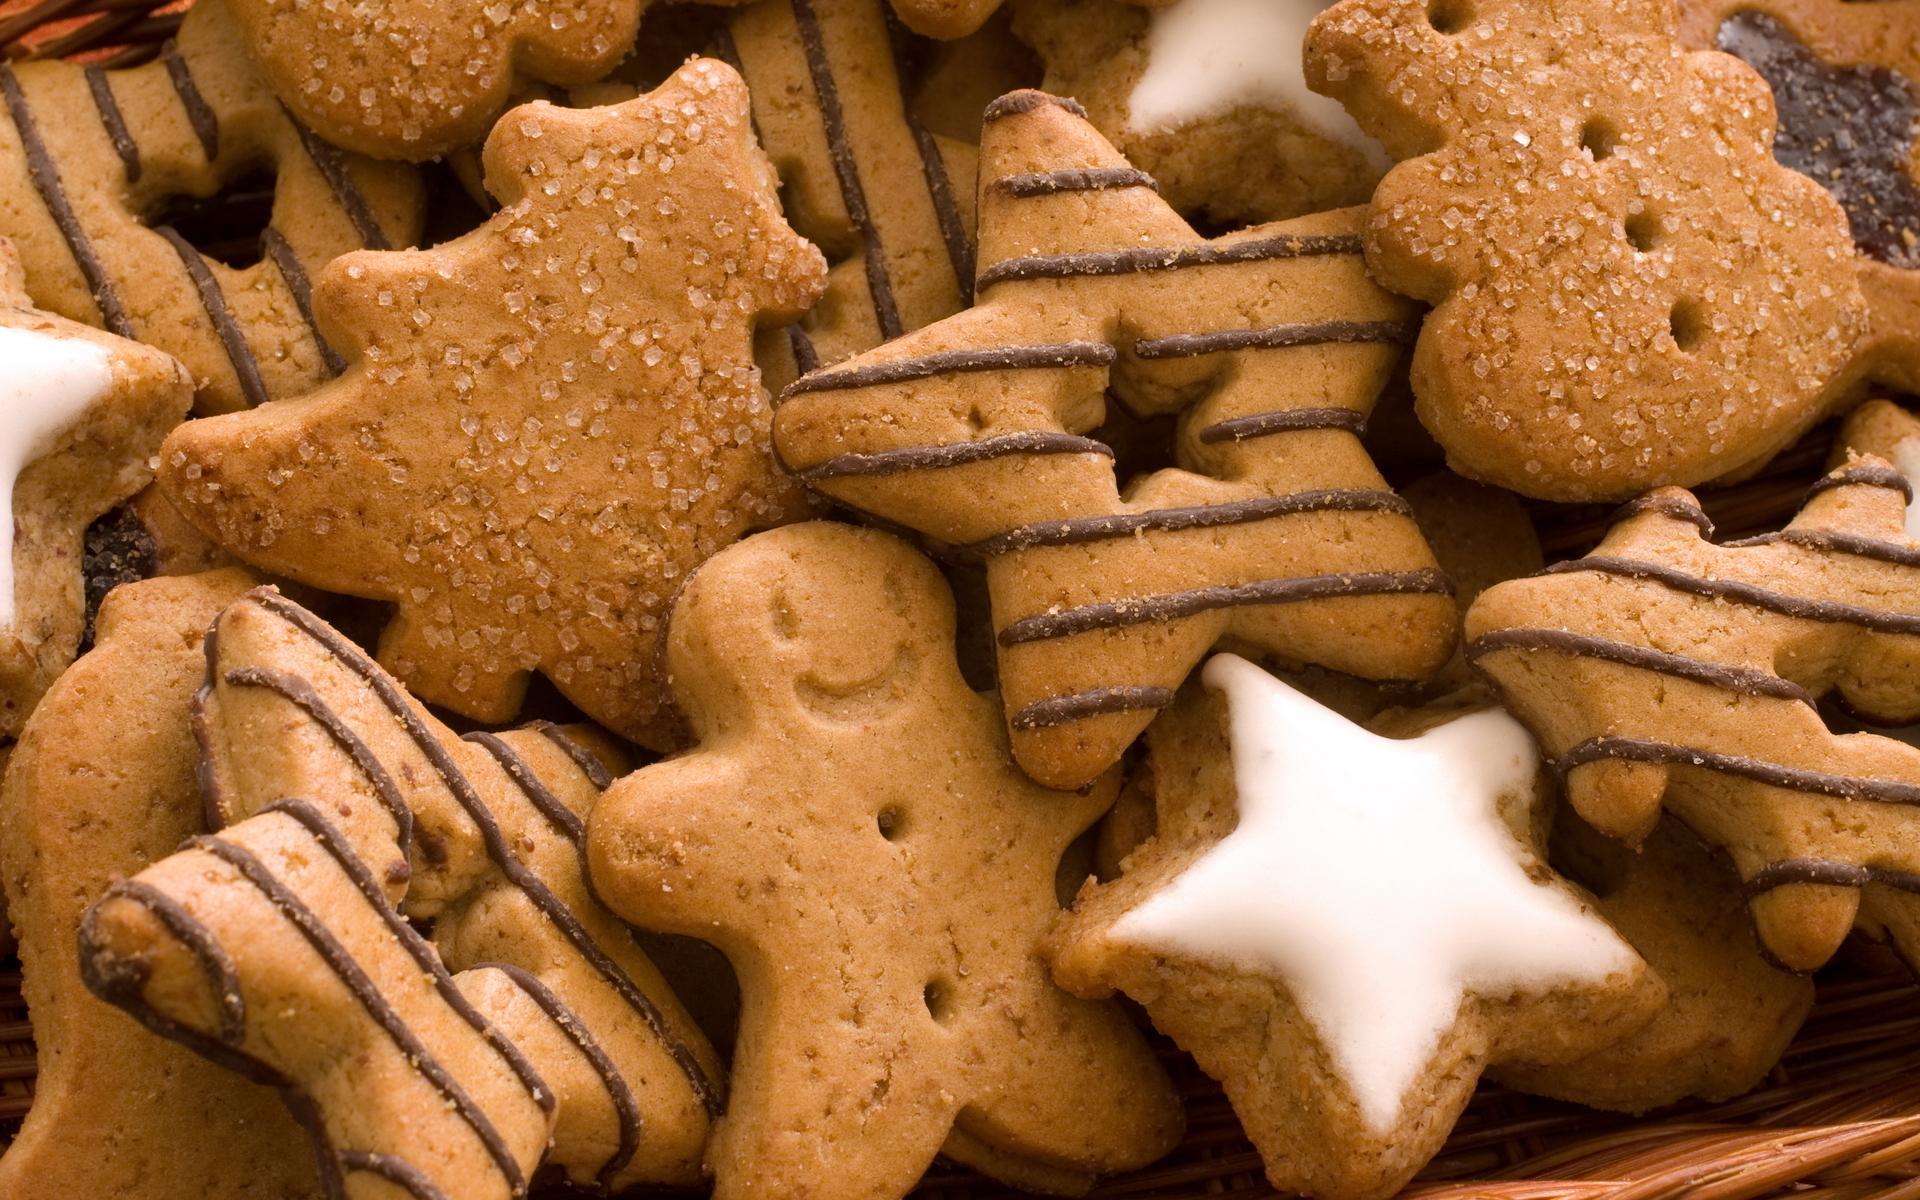 Christmas Cookies Wallpaper.Christmas Cookies Wallpapers 1920x1200 2301001